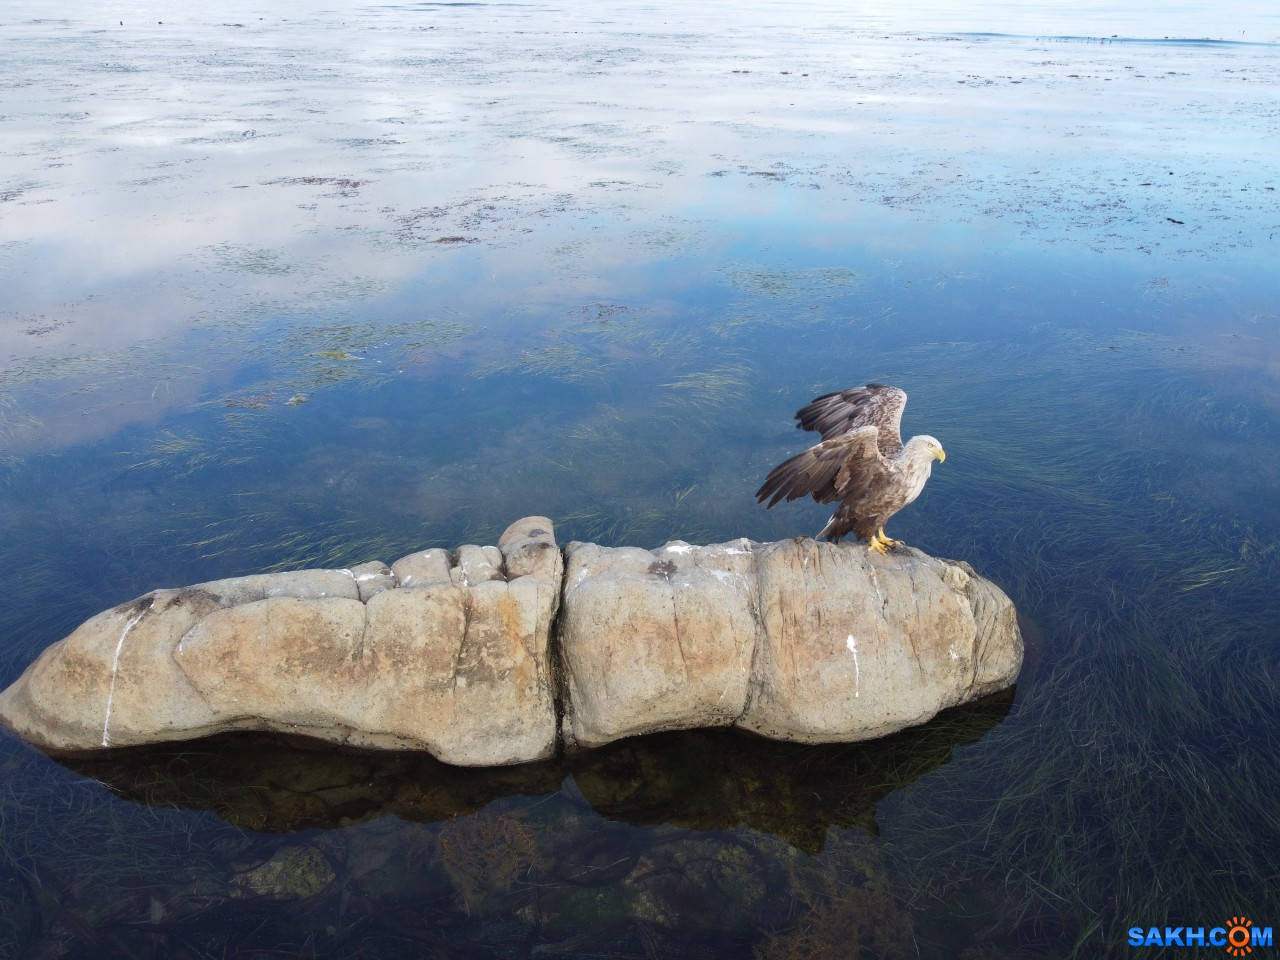 ozzy_link: Белохвостый орлан